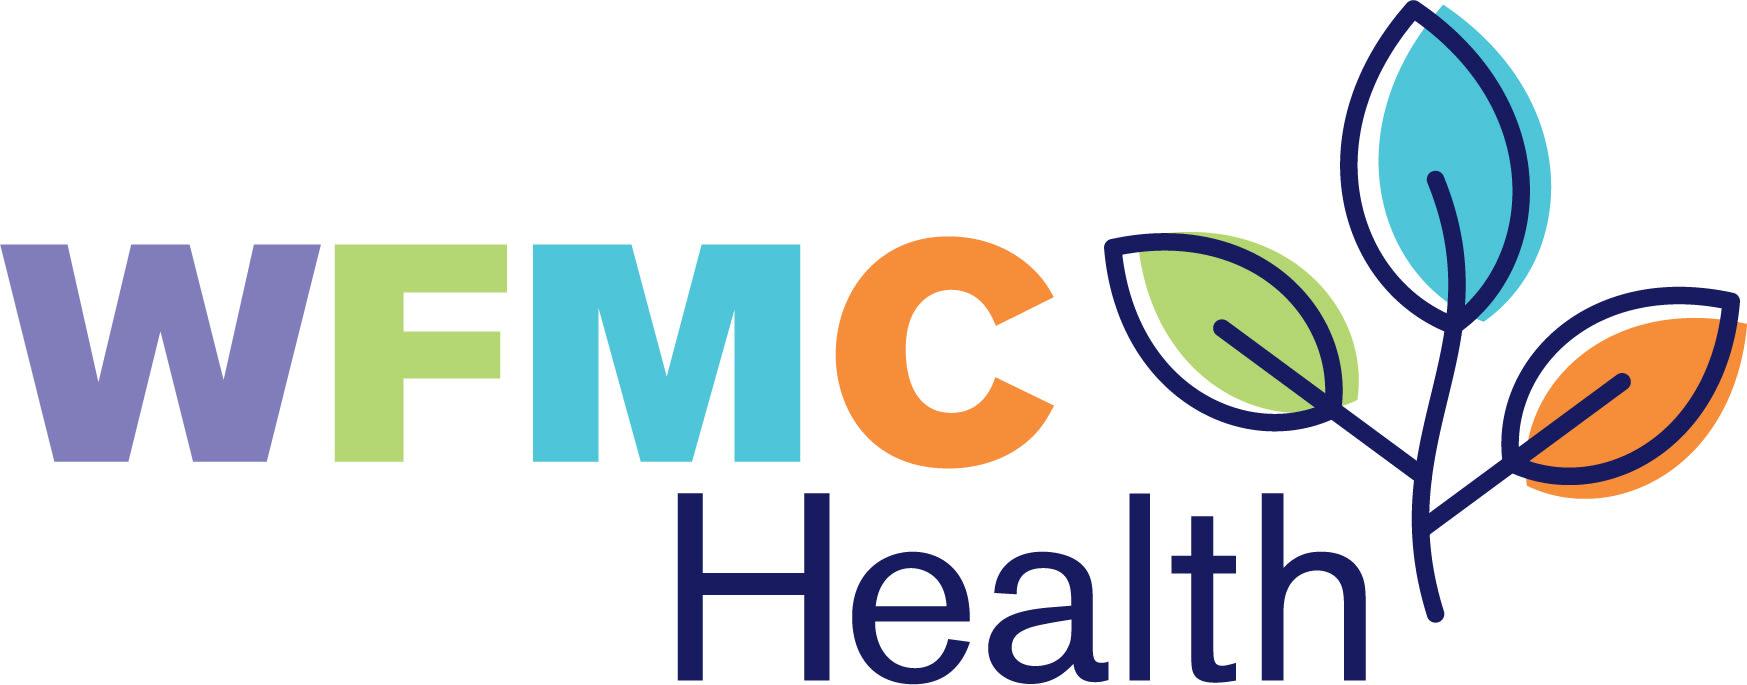 WFMC Health